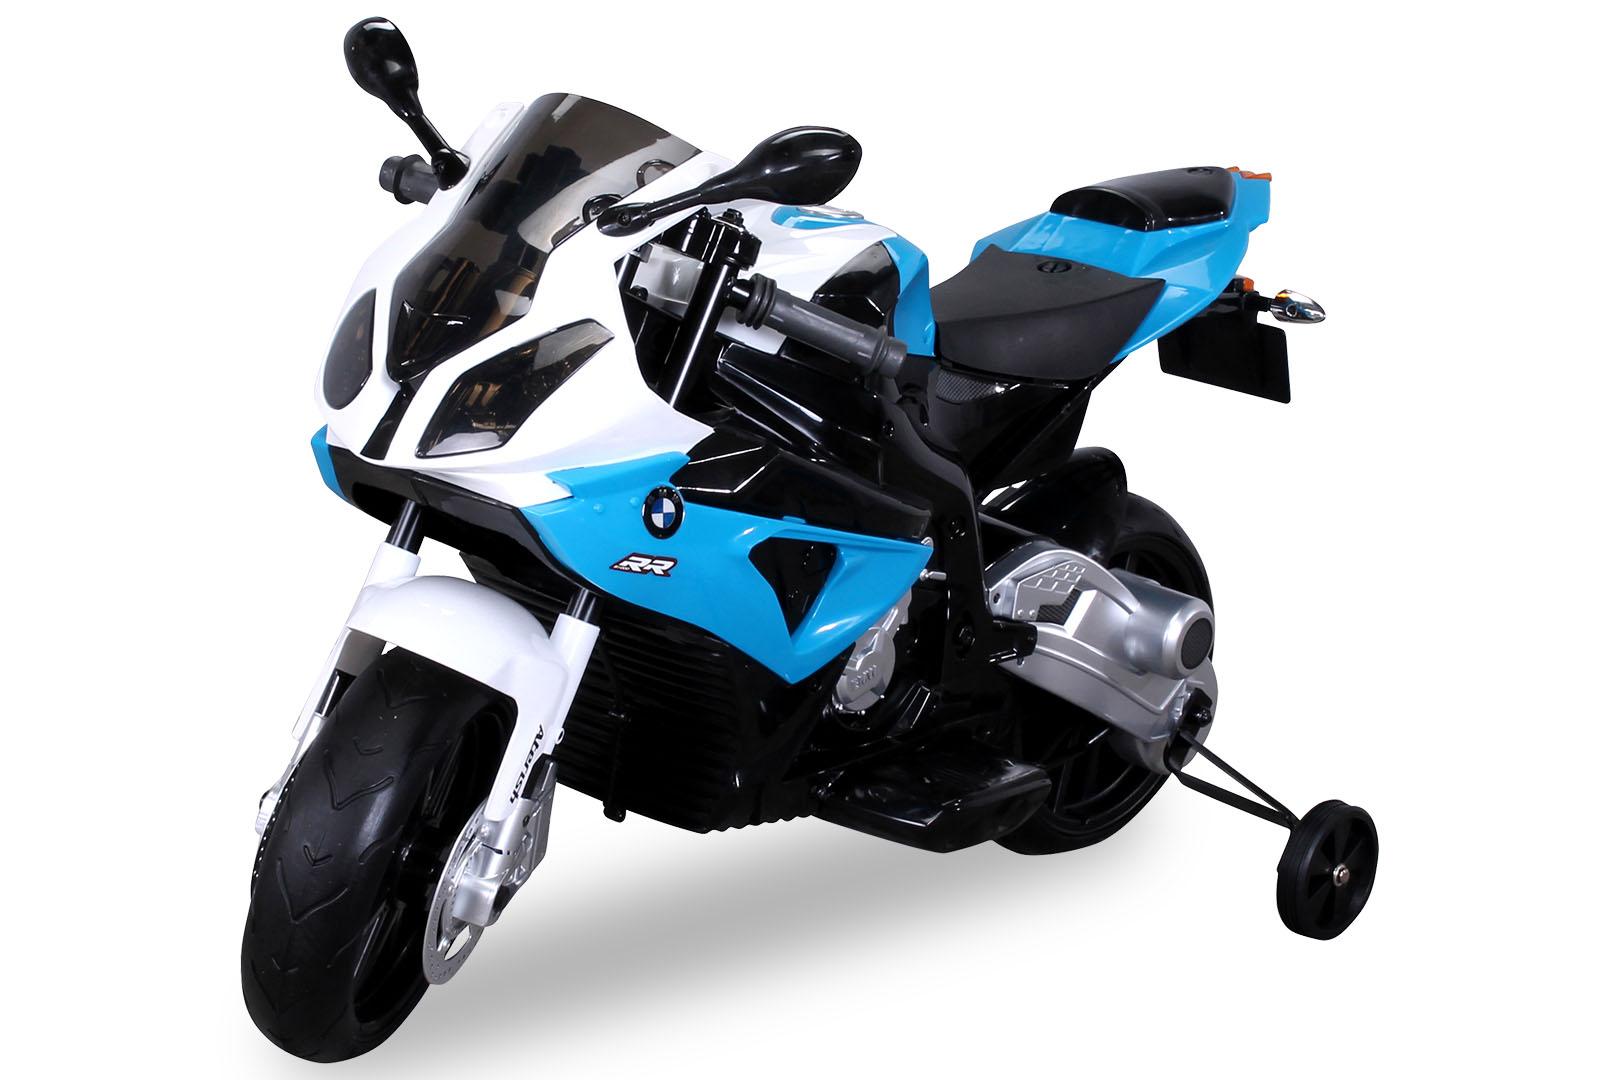 motorrad dreirad roller kinderfahrzeuge ab 3 jahre elektrofahrzeuge actionbikes gmbh. Black Bedroom Furniture Sets. Home Design Ideas